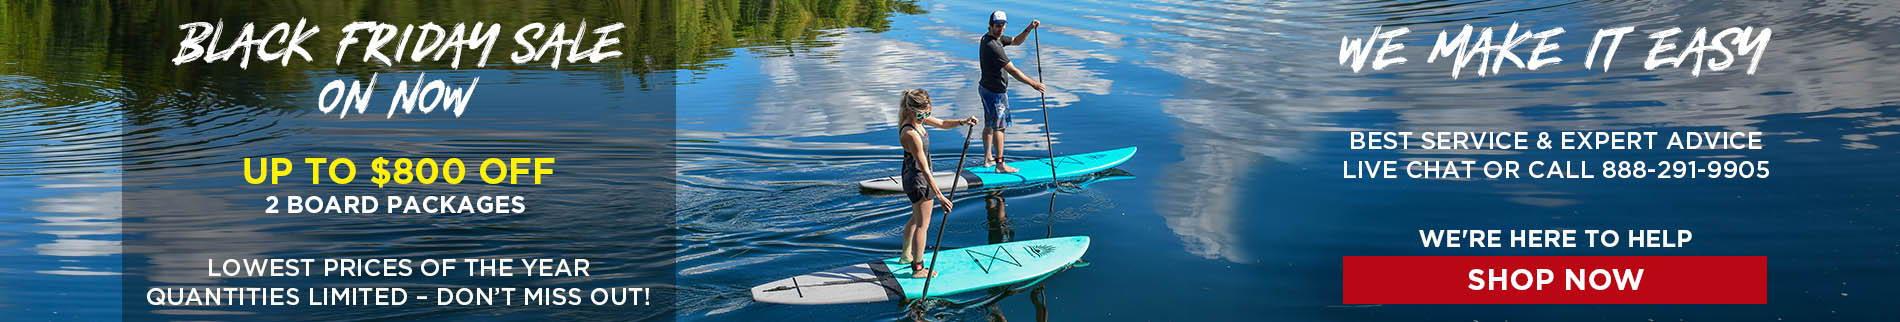 Paddleboard Direct Couple Paddling  Cruiser SUP Escape Super-Lite On Beautiful Lake| Black Friday Paddle Board Sale